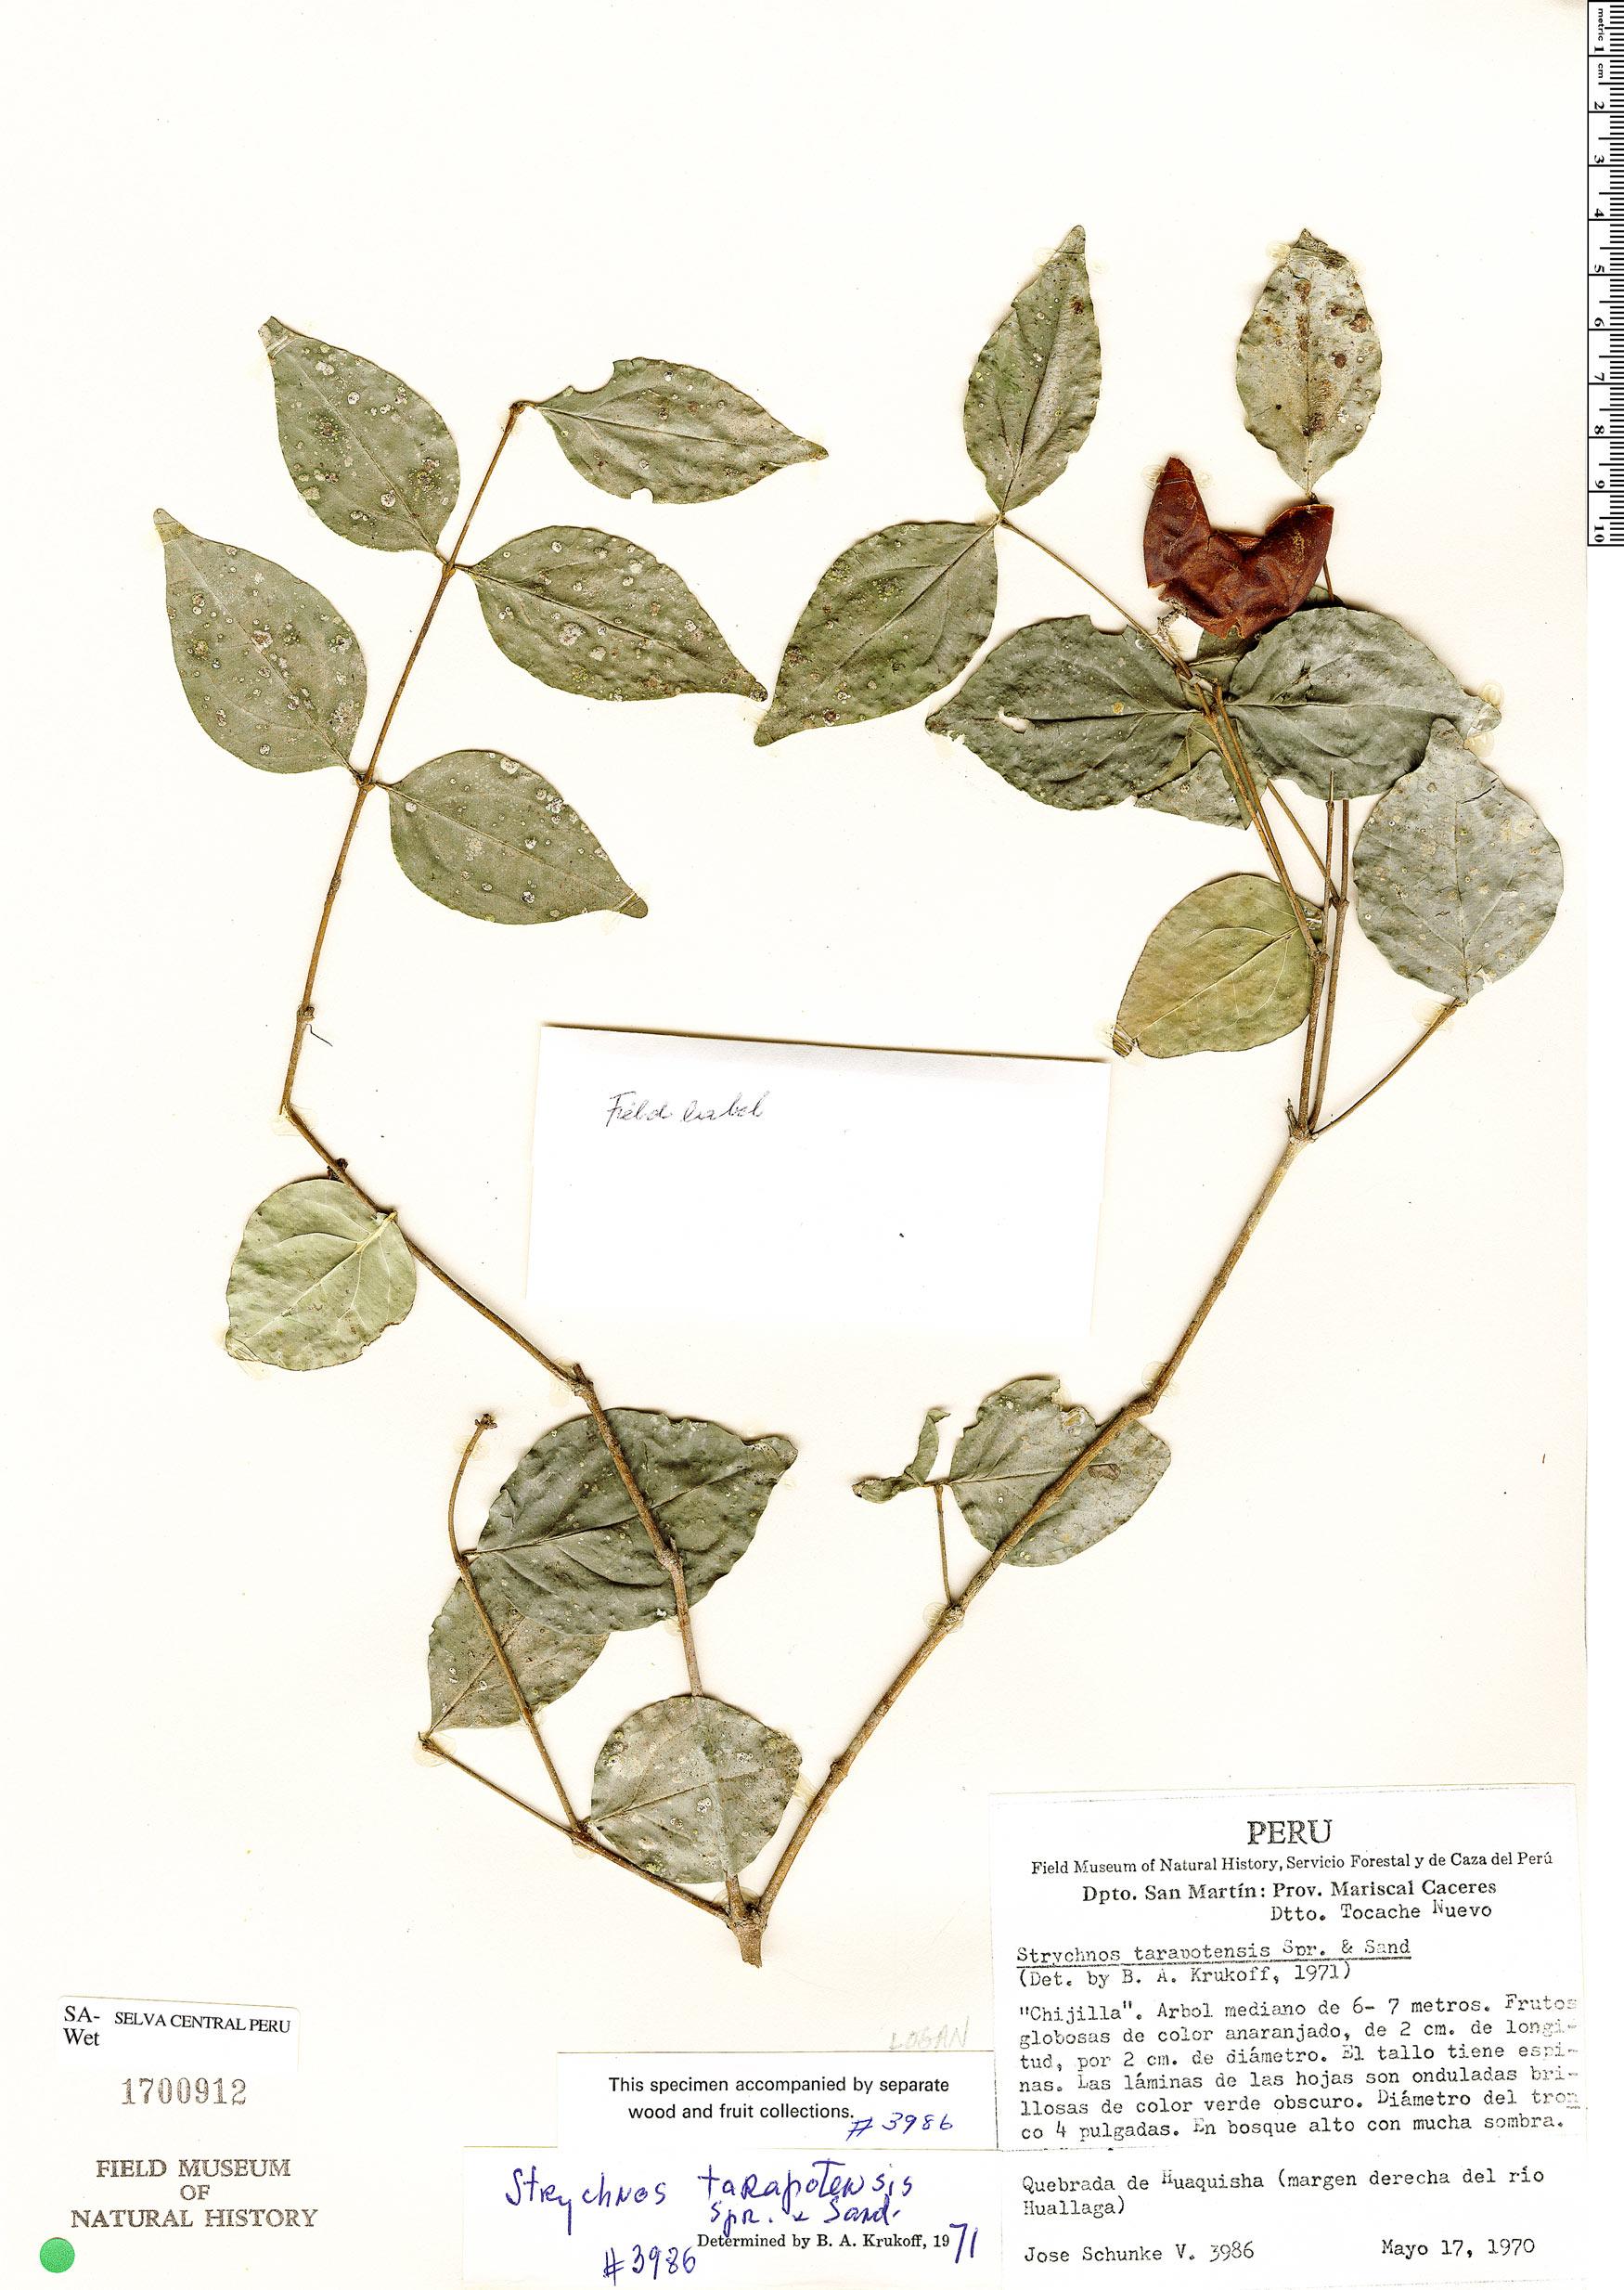 Specimen: Strychnos tarapotensis